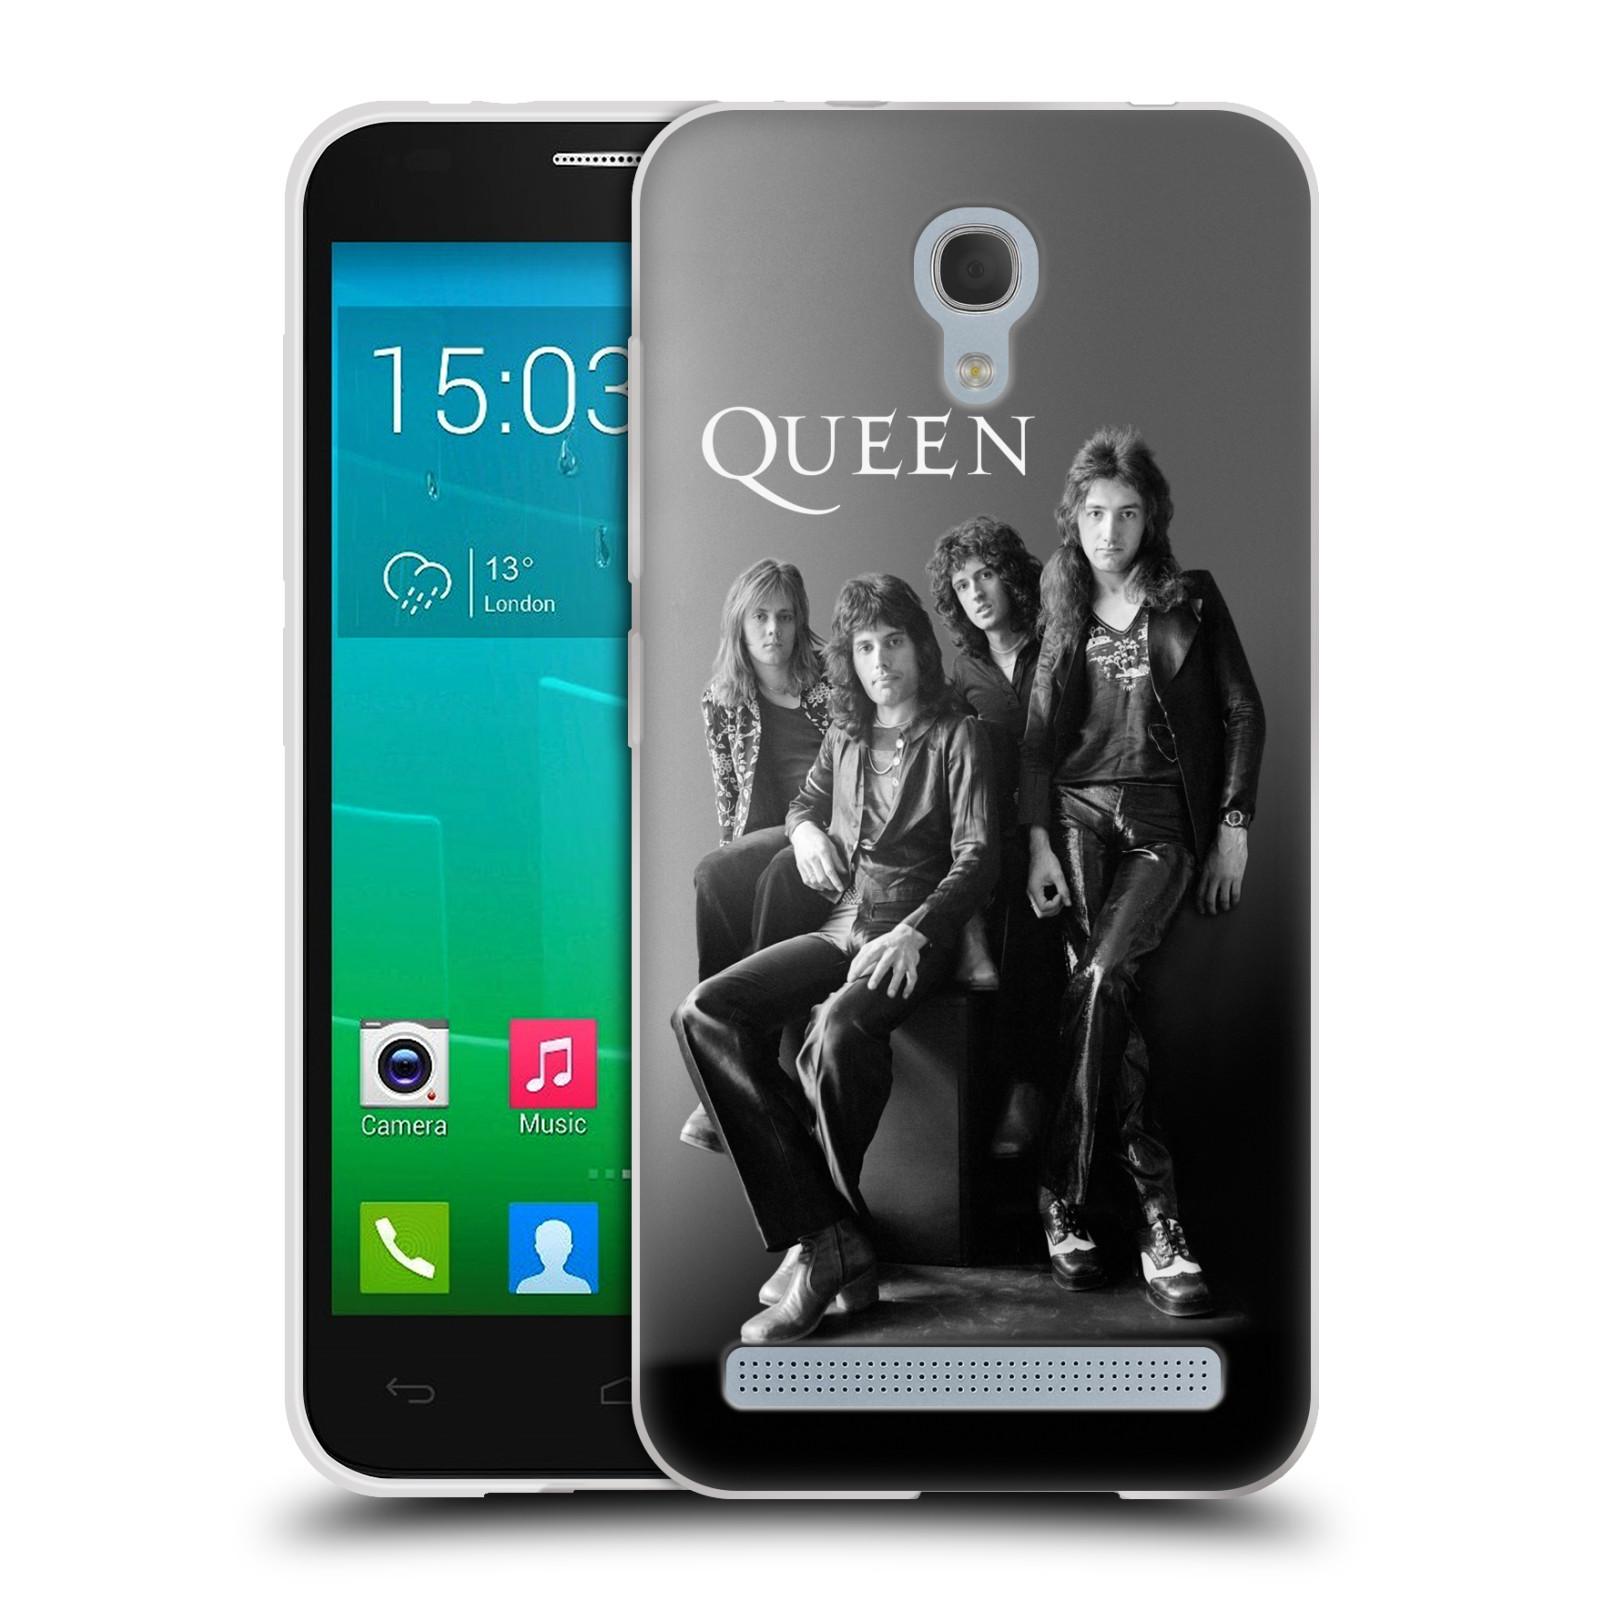 Silikonové pouzdro na mobil Alcatel One Touch Idol 2 Mini S 6036Y HEAD CASE Queen - Skupina (Silikonový kryt či obal na mobilní telefon licencovaným motivem Queen pro Alcatel Idol 2 Mini S OT-6036Y)